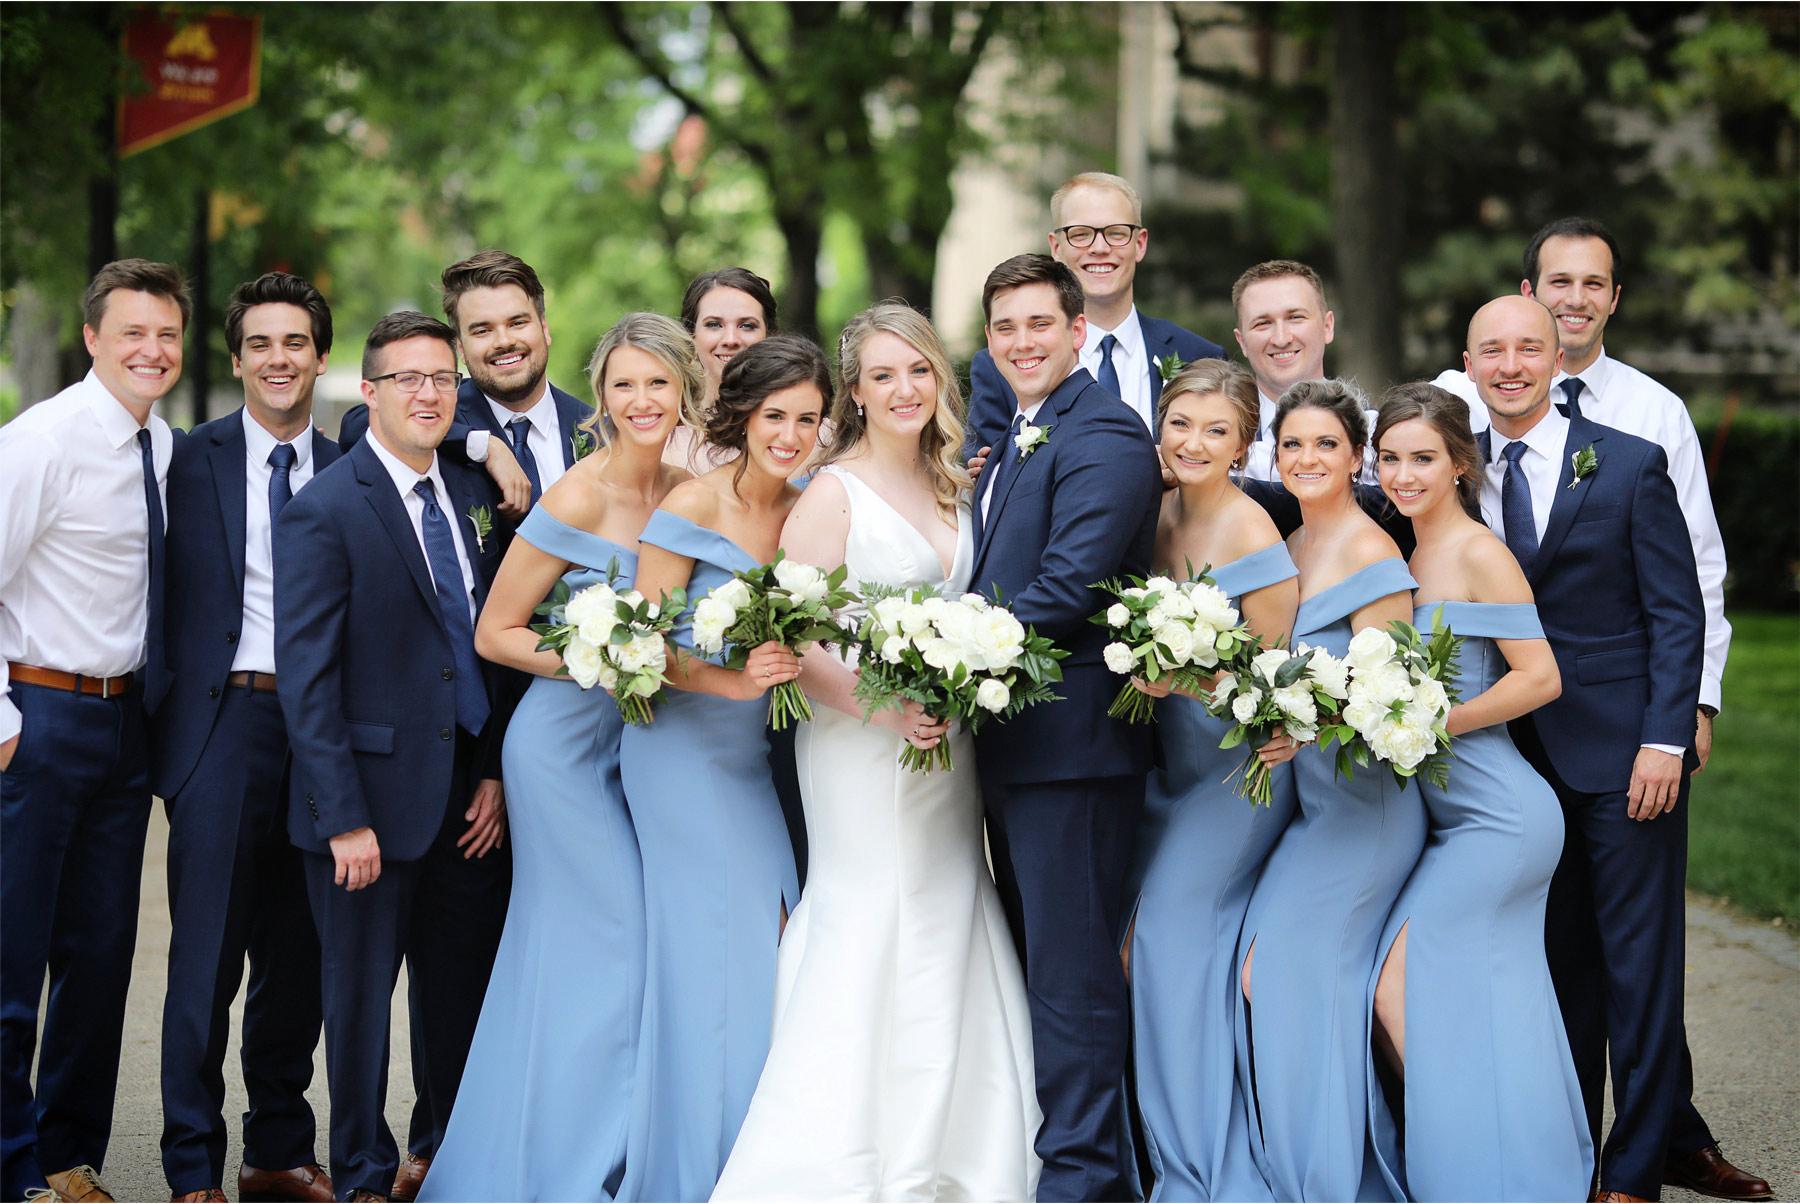 11-Minneapolis-Minnesota-Wedding-Vick-Photography-The-Depot-Bridesmaids-Groomsmen-Amelia-and-Alexander.jpg